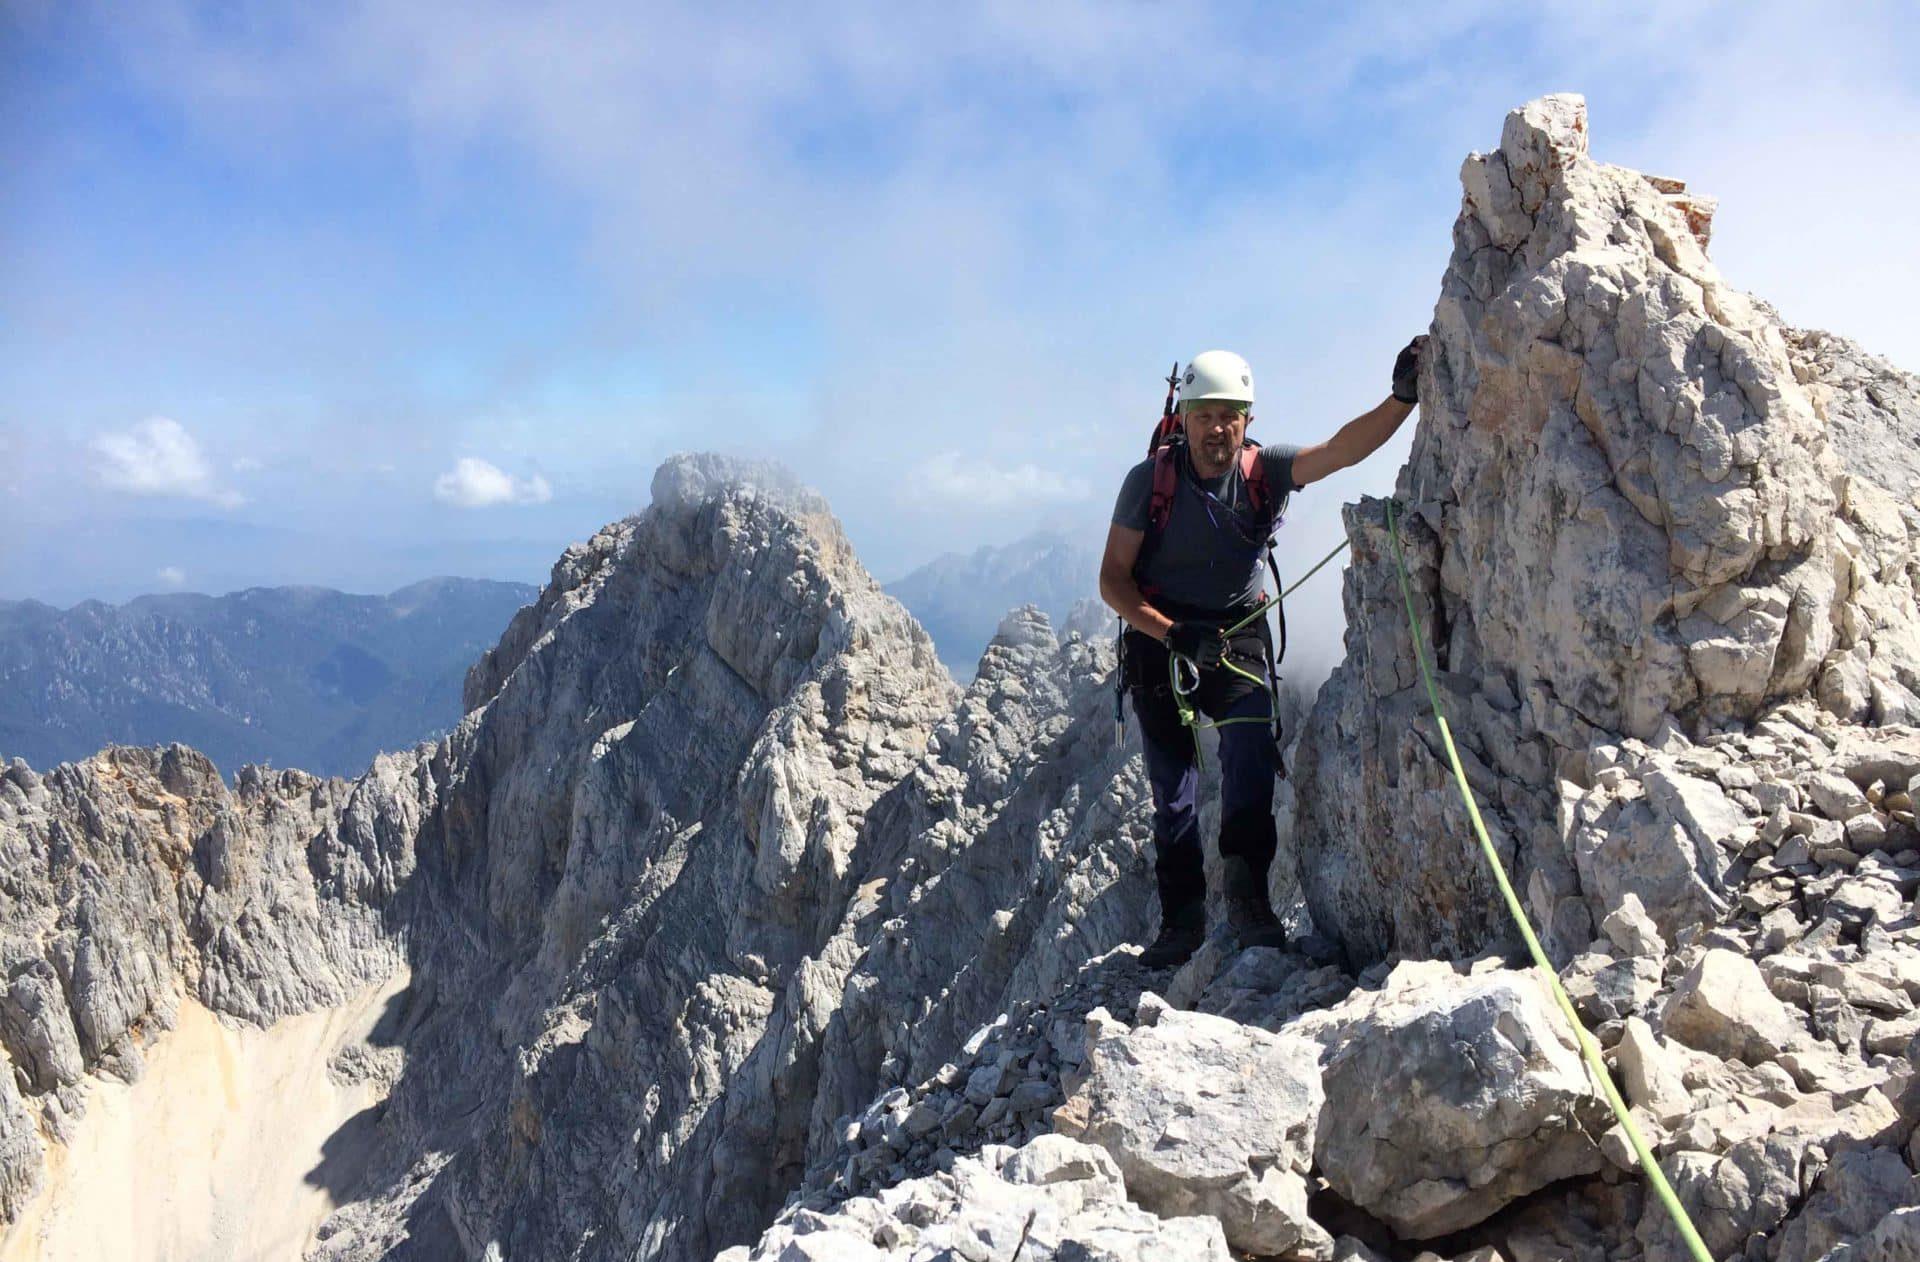 Climbing traverse in the Kamnik-Savinja Alps